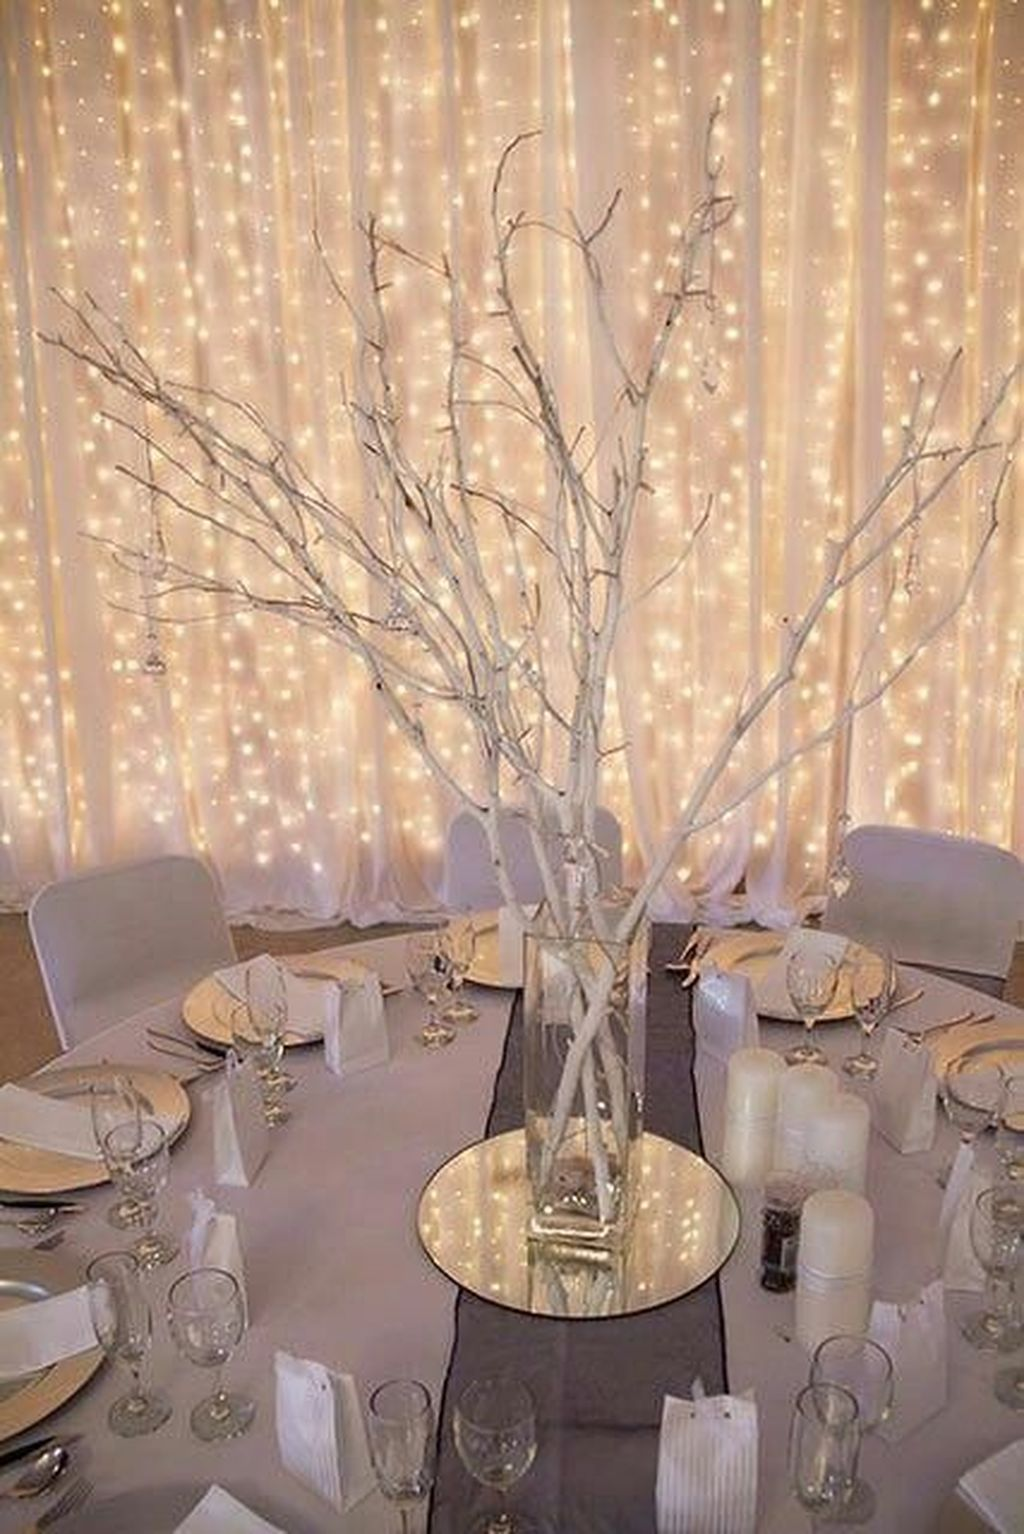 42 Beautiful Winter Wonderland Lighting Ideas For Outdoor And Indoor Decor Homyhomee Winter Wedding Decorations Wedding Themes Winter Diy Winter Wedding